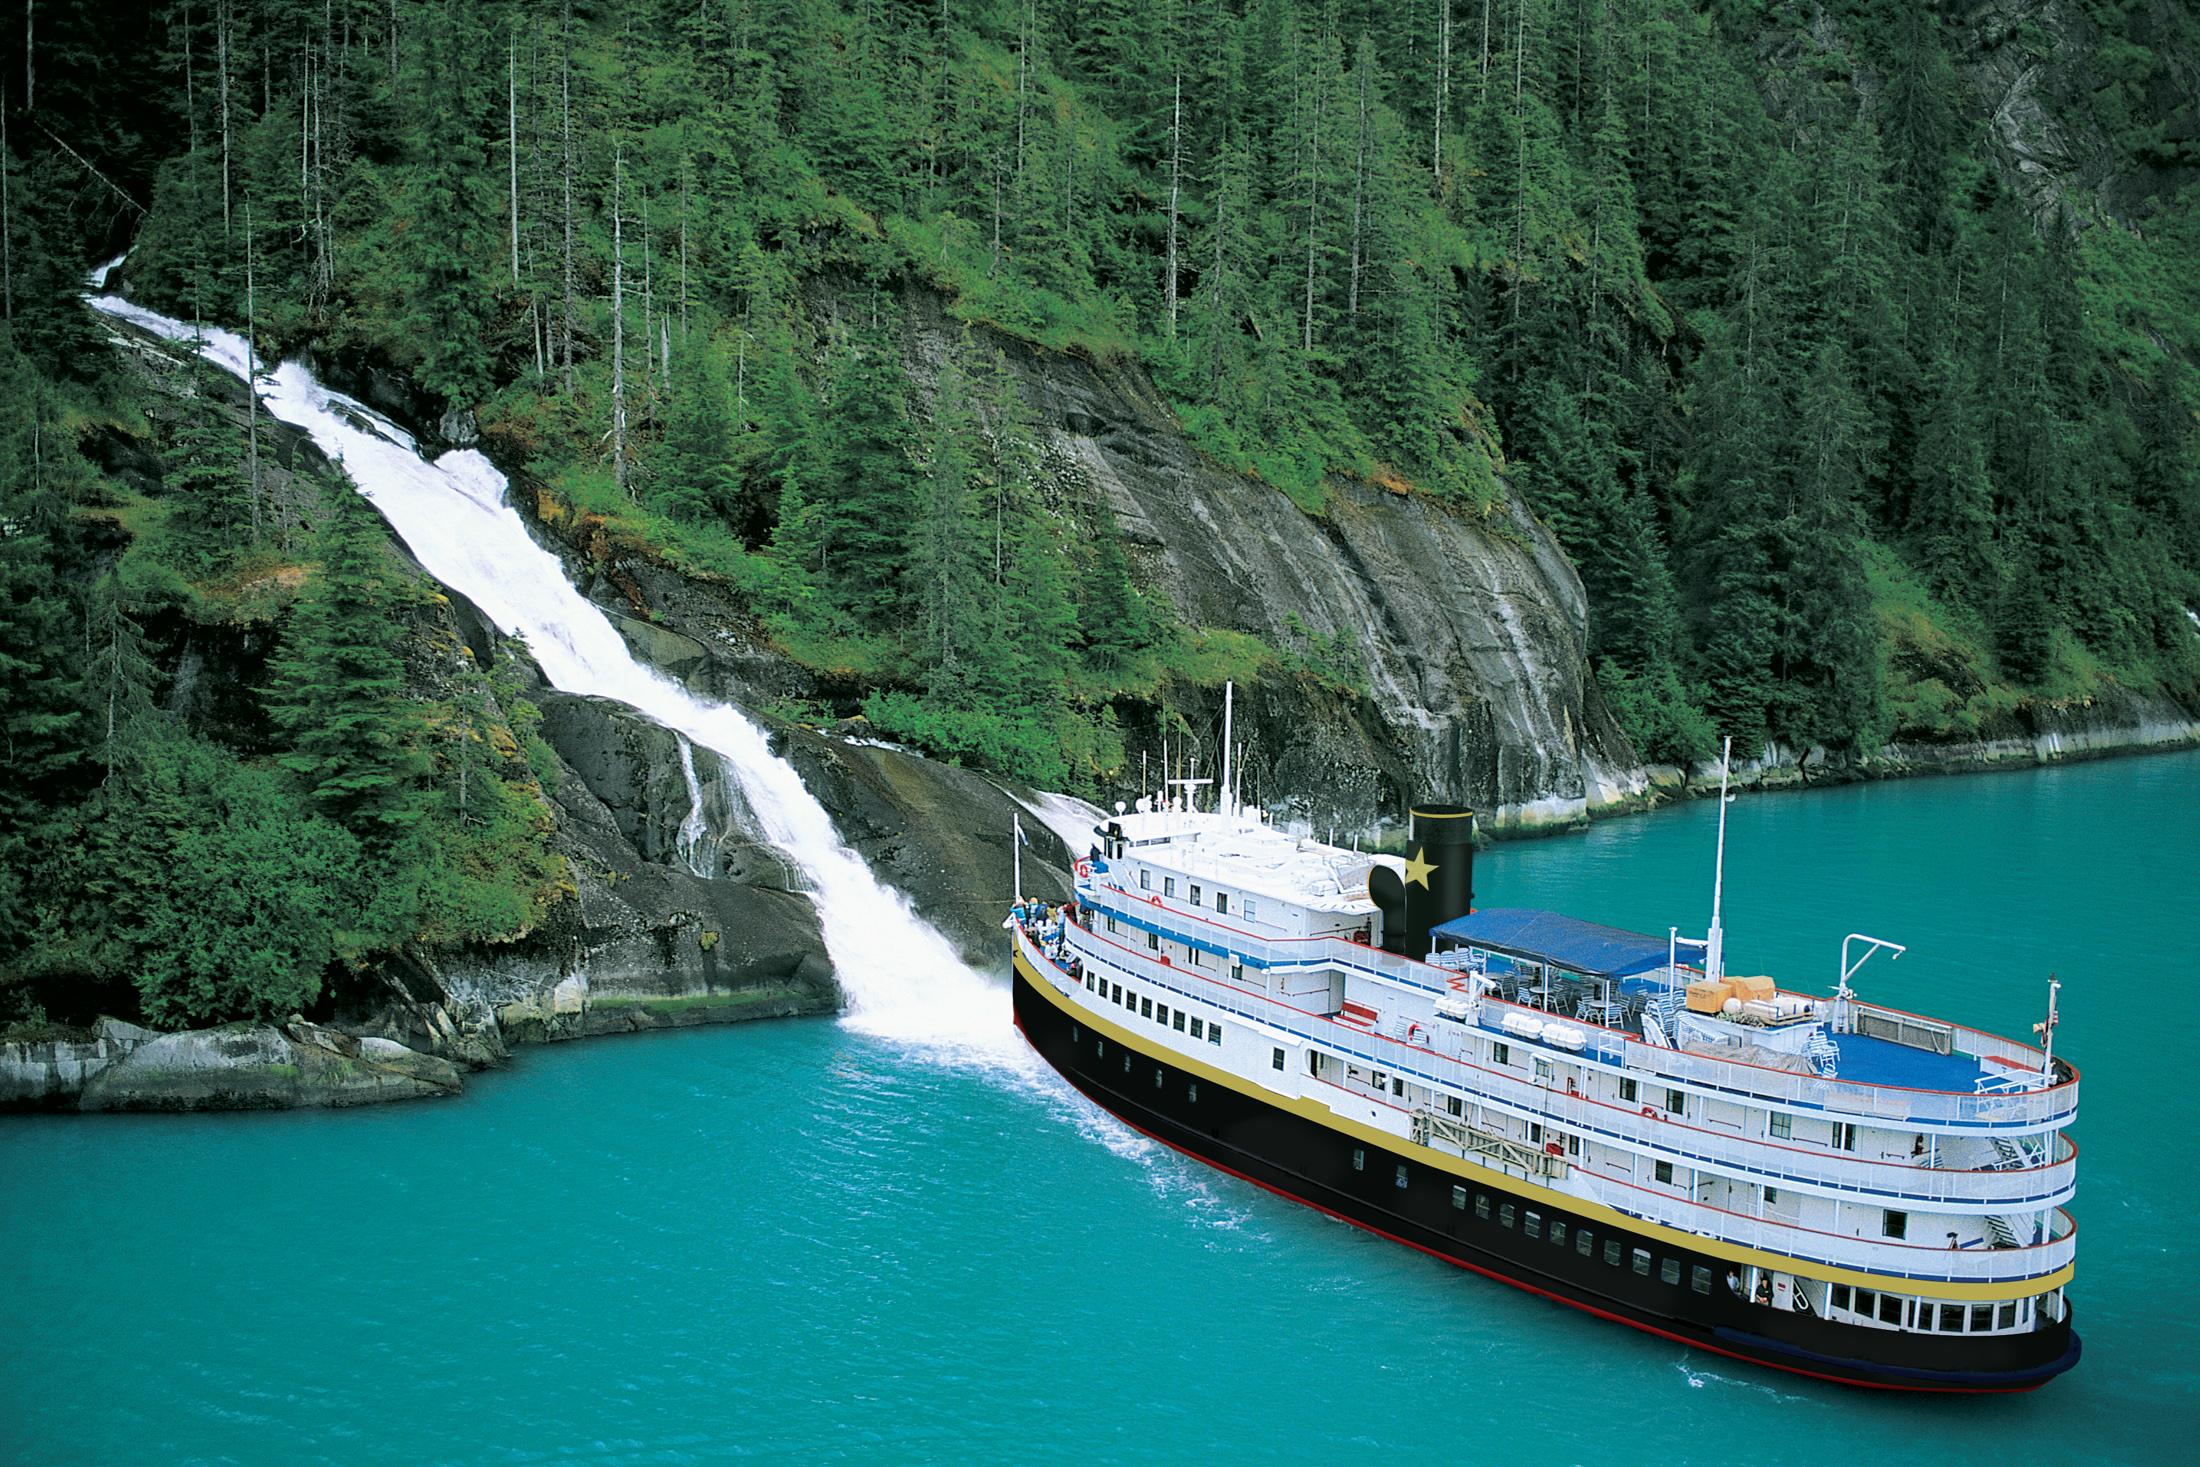 file:s.s. legacy in se alaska (waterfall) - wikimedia commons